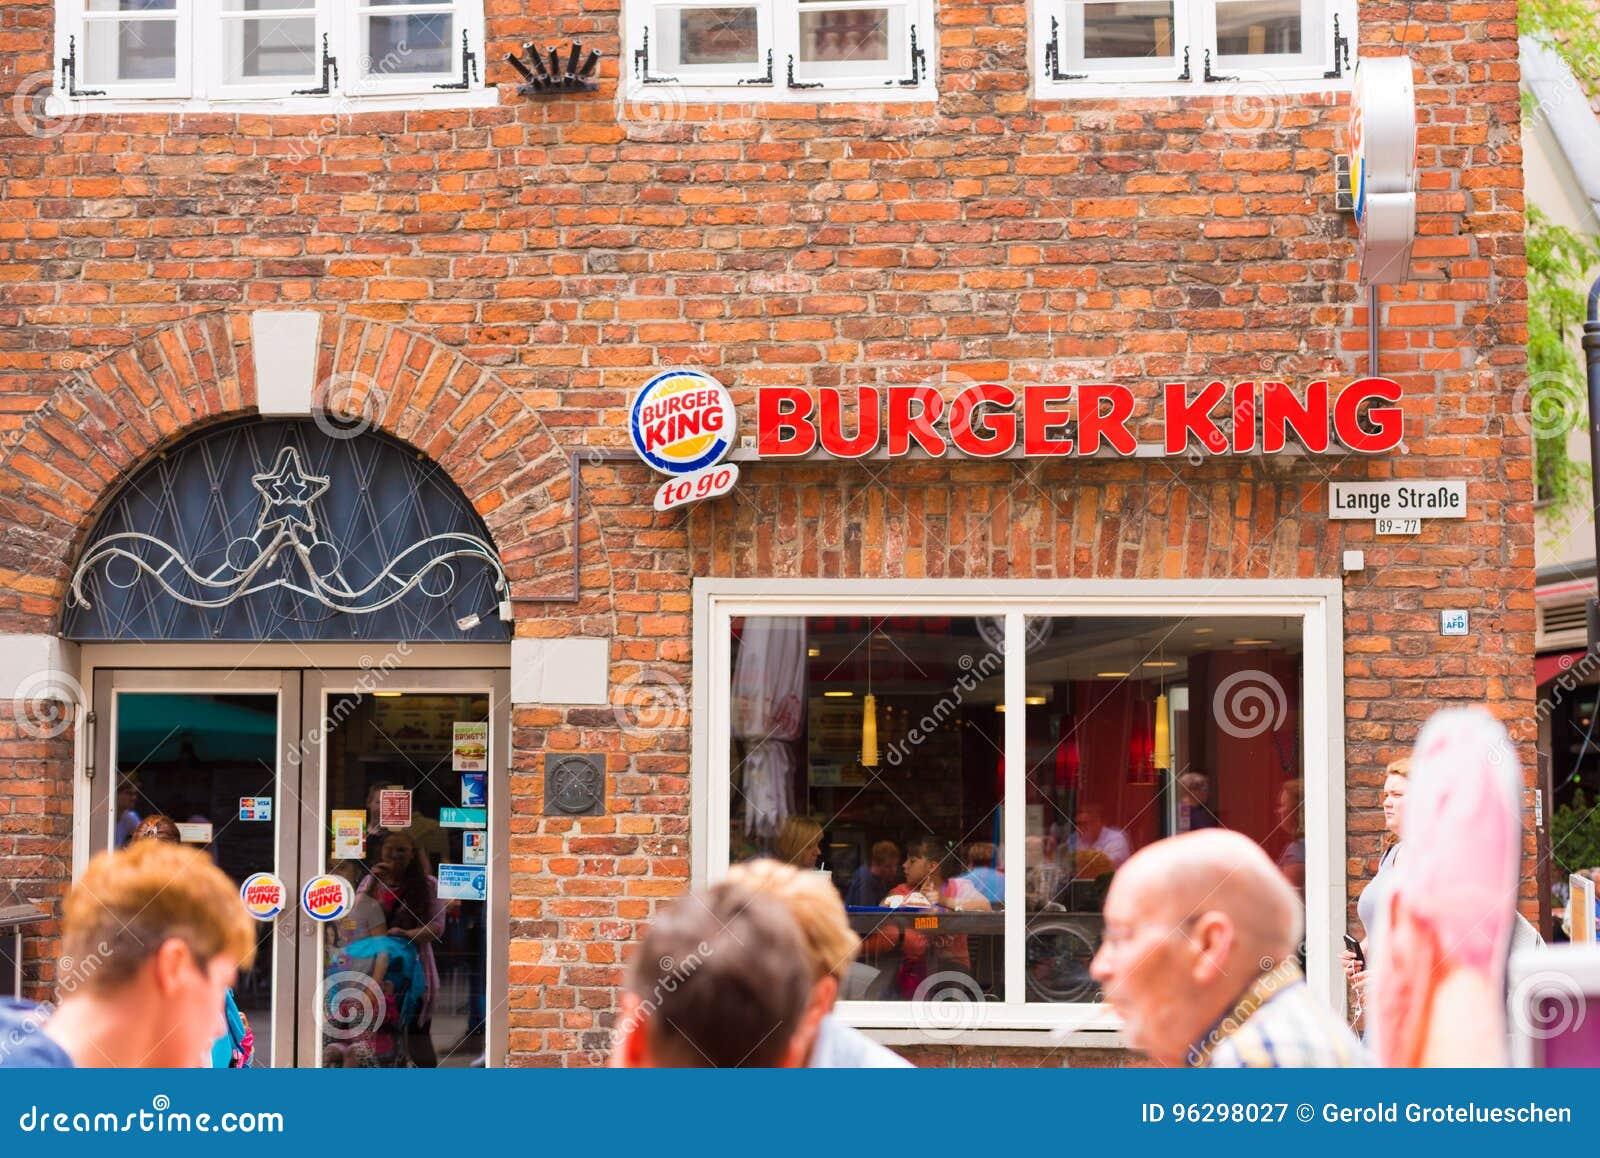 Burger King Oldenburg